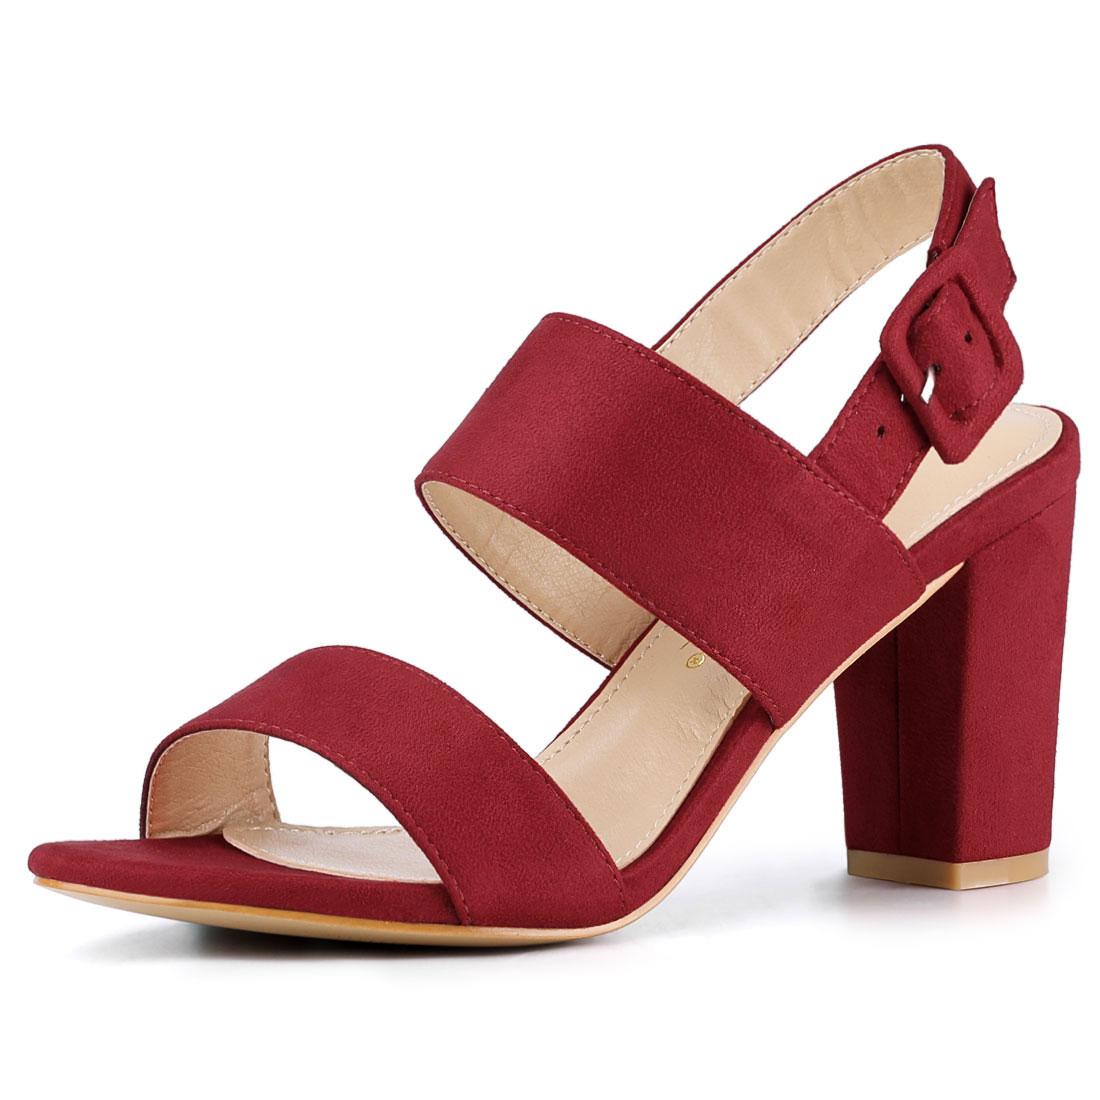 Women Open Toe Slingback High Block Heel Sandals Red US 8.5